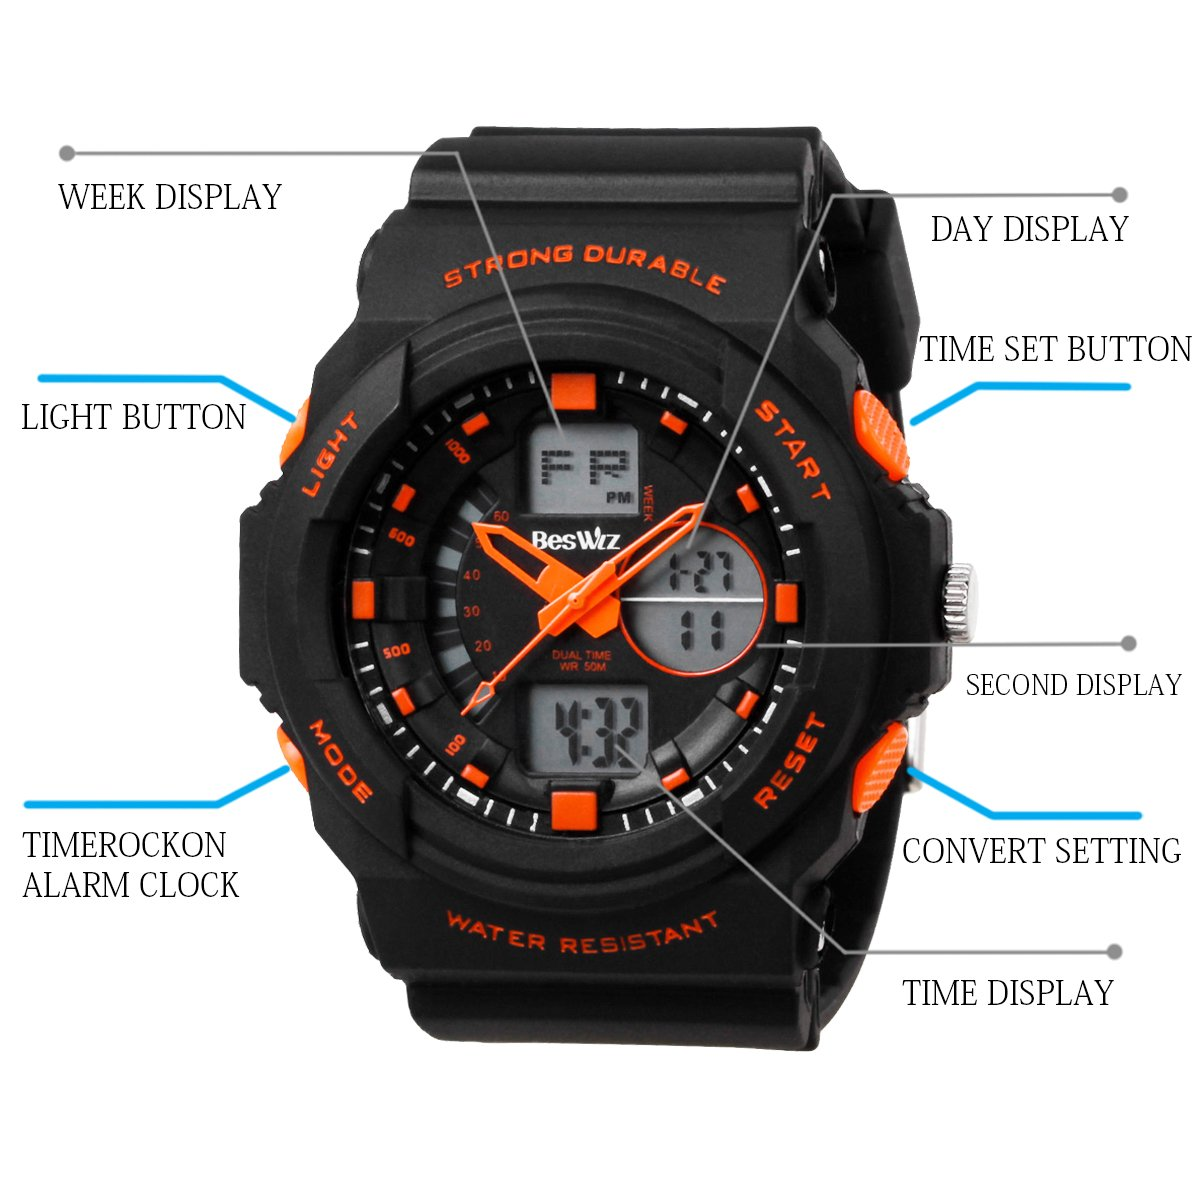 BesWLZ Multi Function Digital LED Quartz Watch Water Resistant Electronic Sport Watches Child Orange by BesWlz (Image #5)